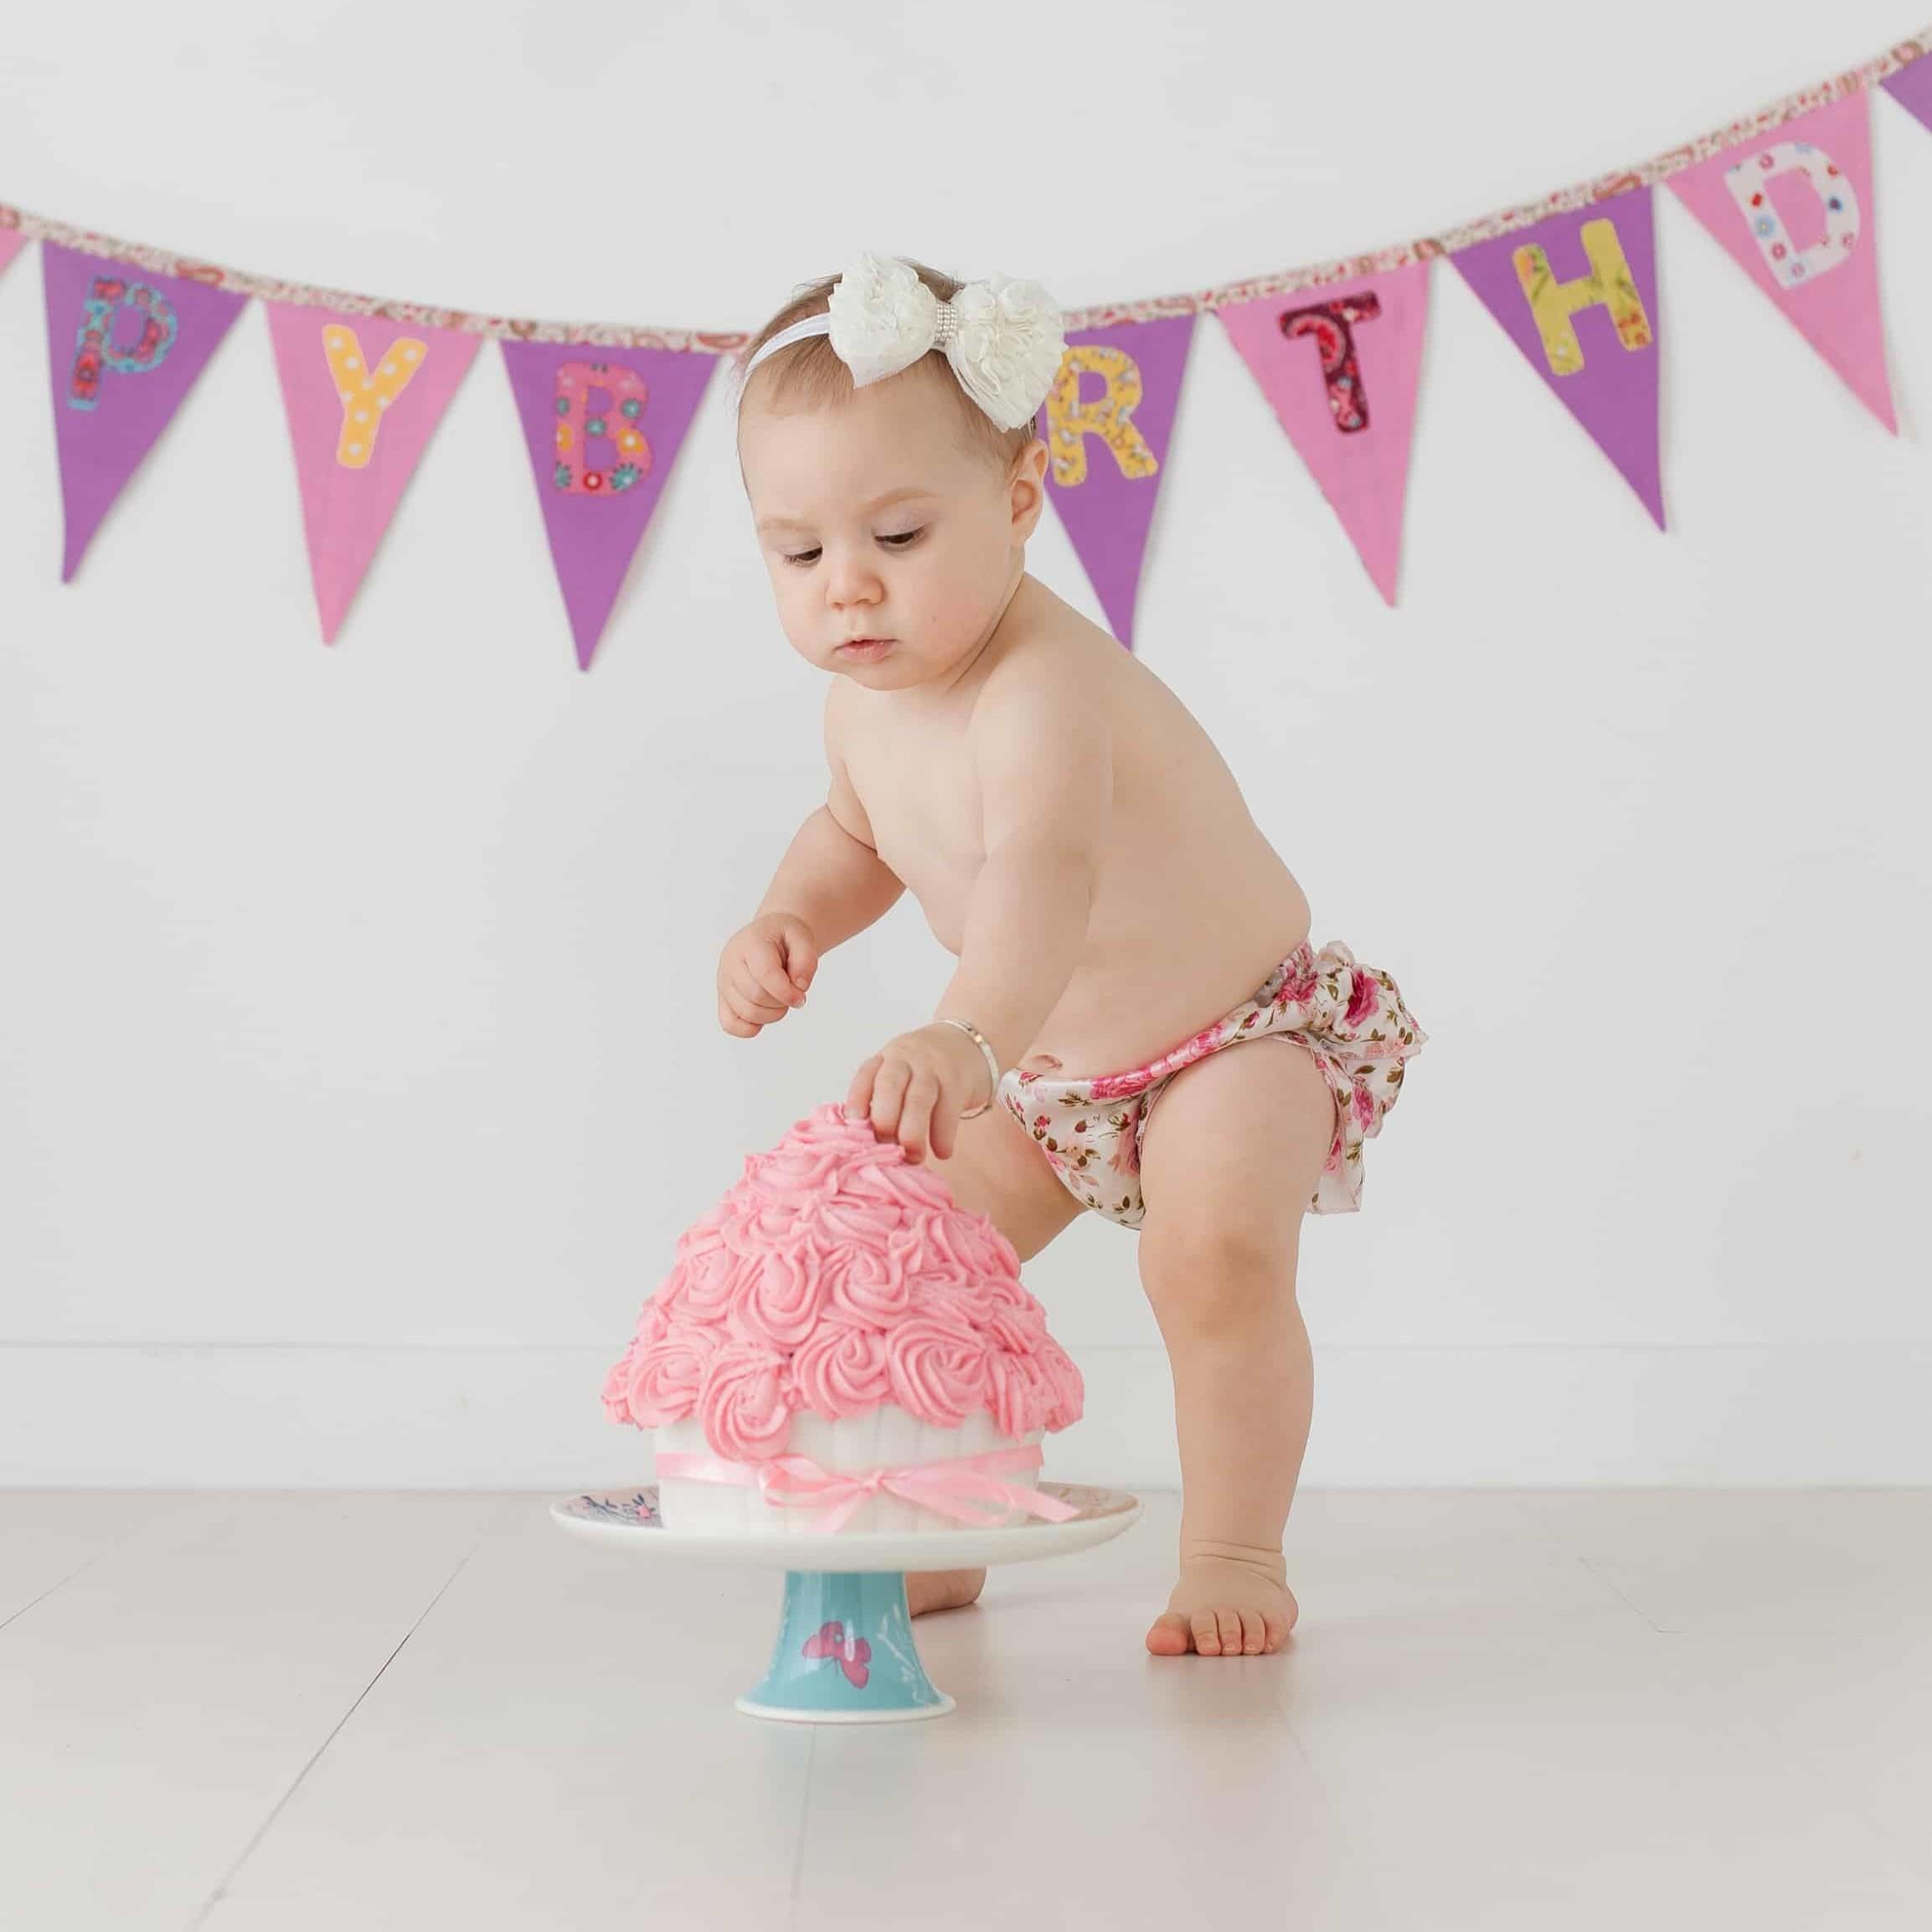 First Birthday Cake Smash Photography | Sophia-Belle 30